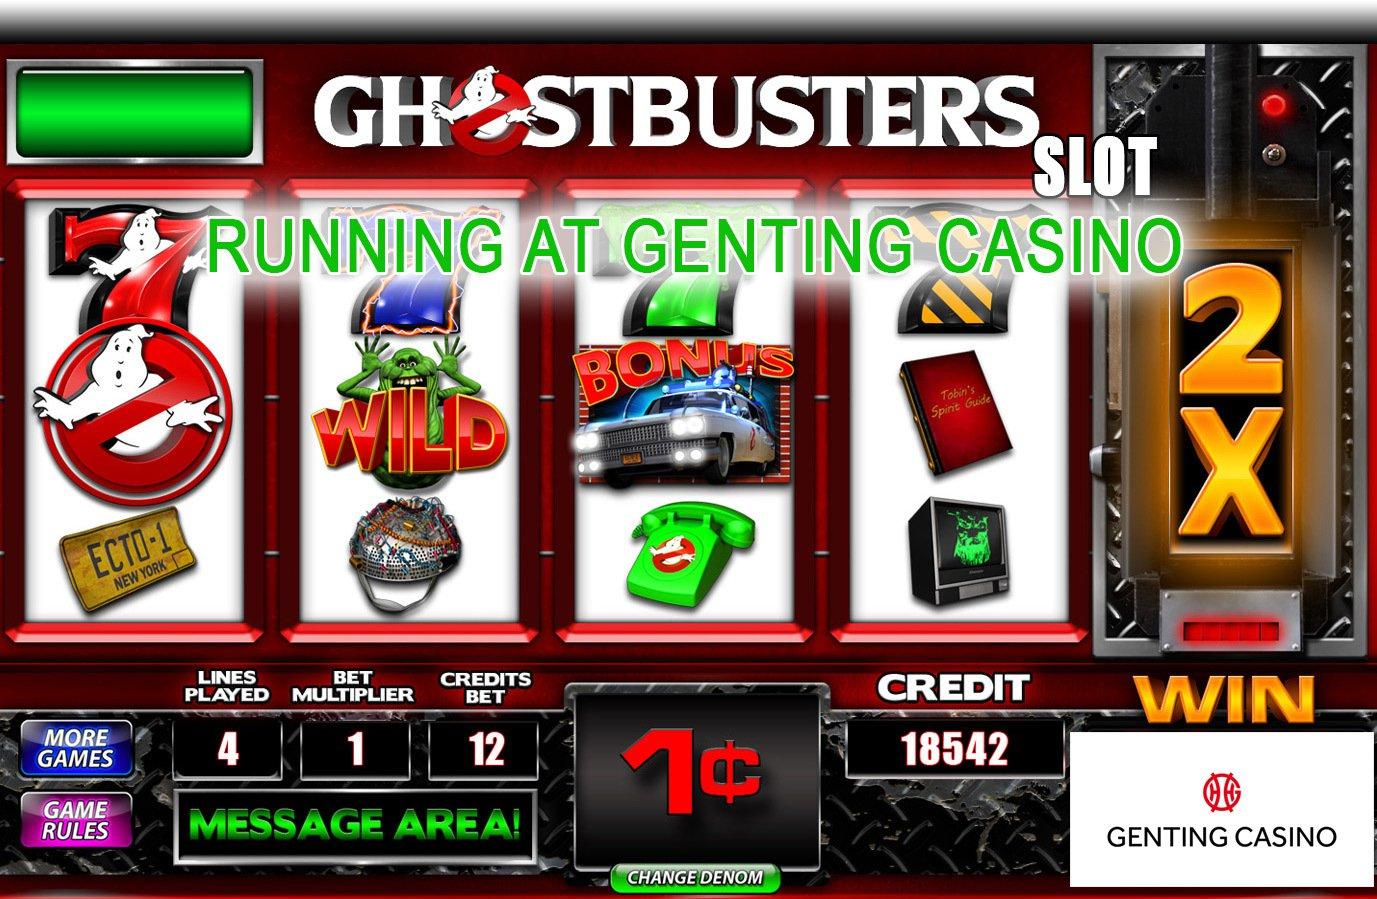 Ghostbuster Slots